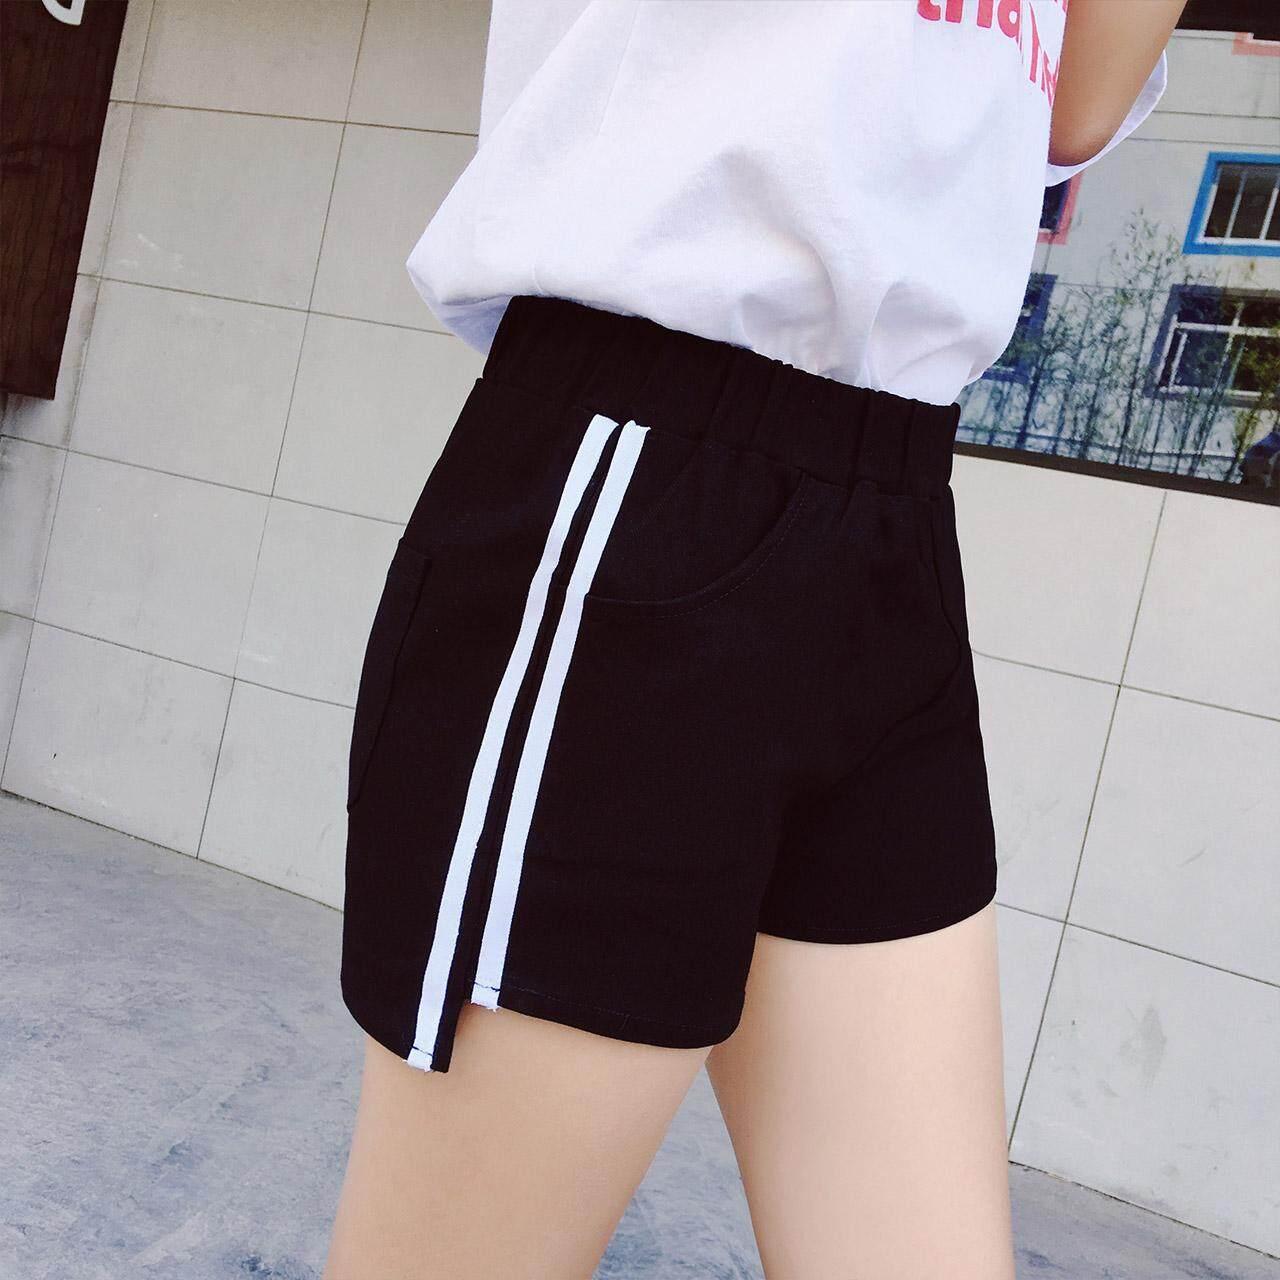 Looesn Korea Fashion Style Katun Baru Bagian Tipis Celana Pendek Anak Perempuan Panas Warna Hitam Wanita Musim